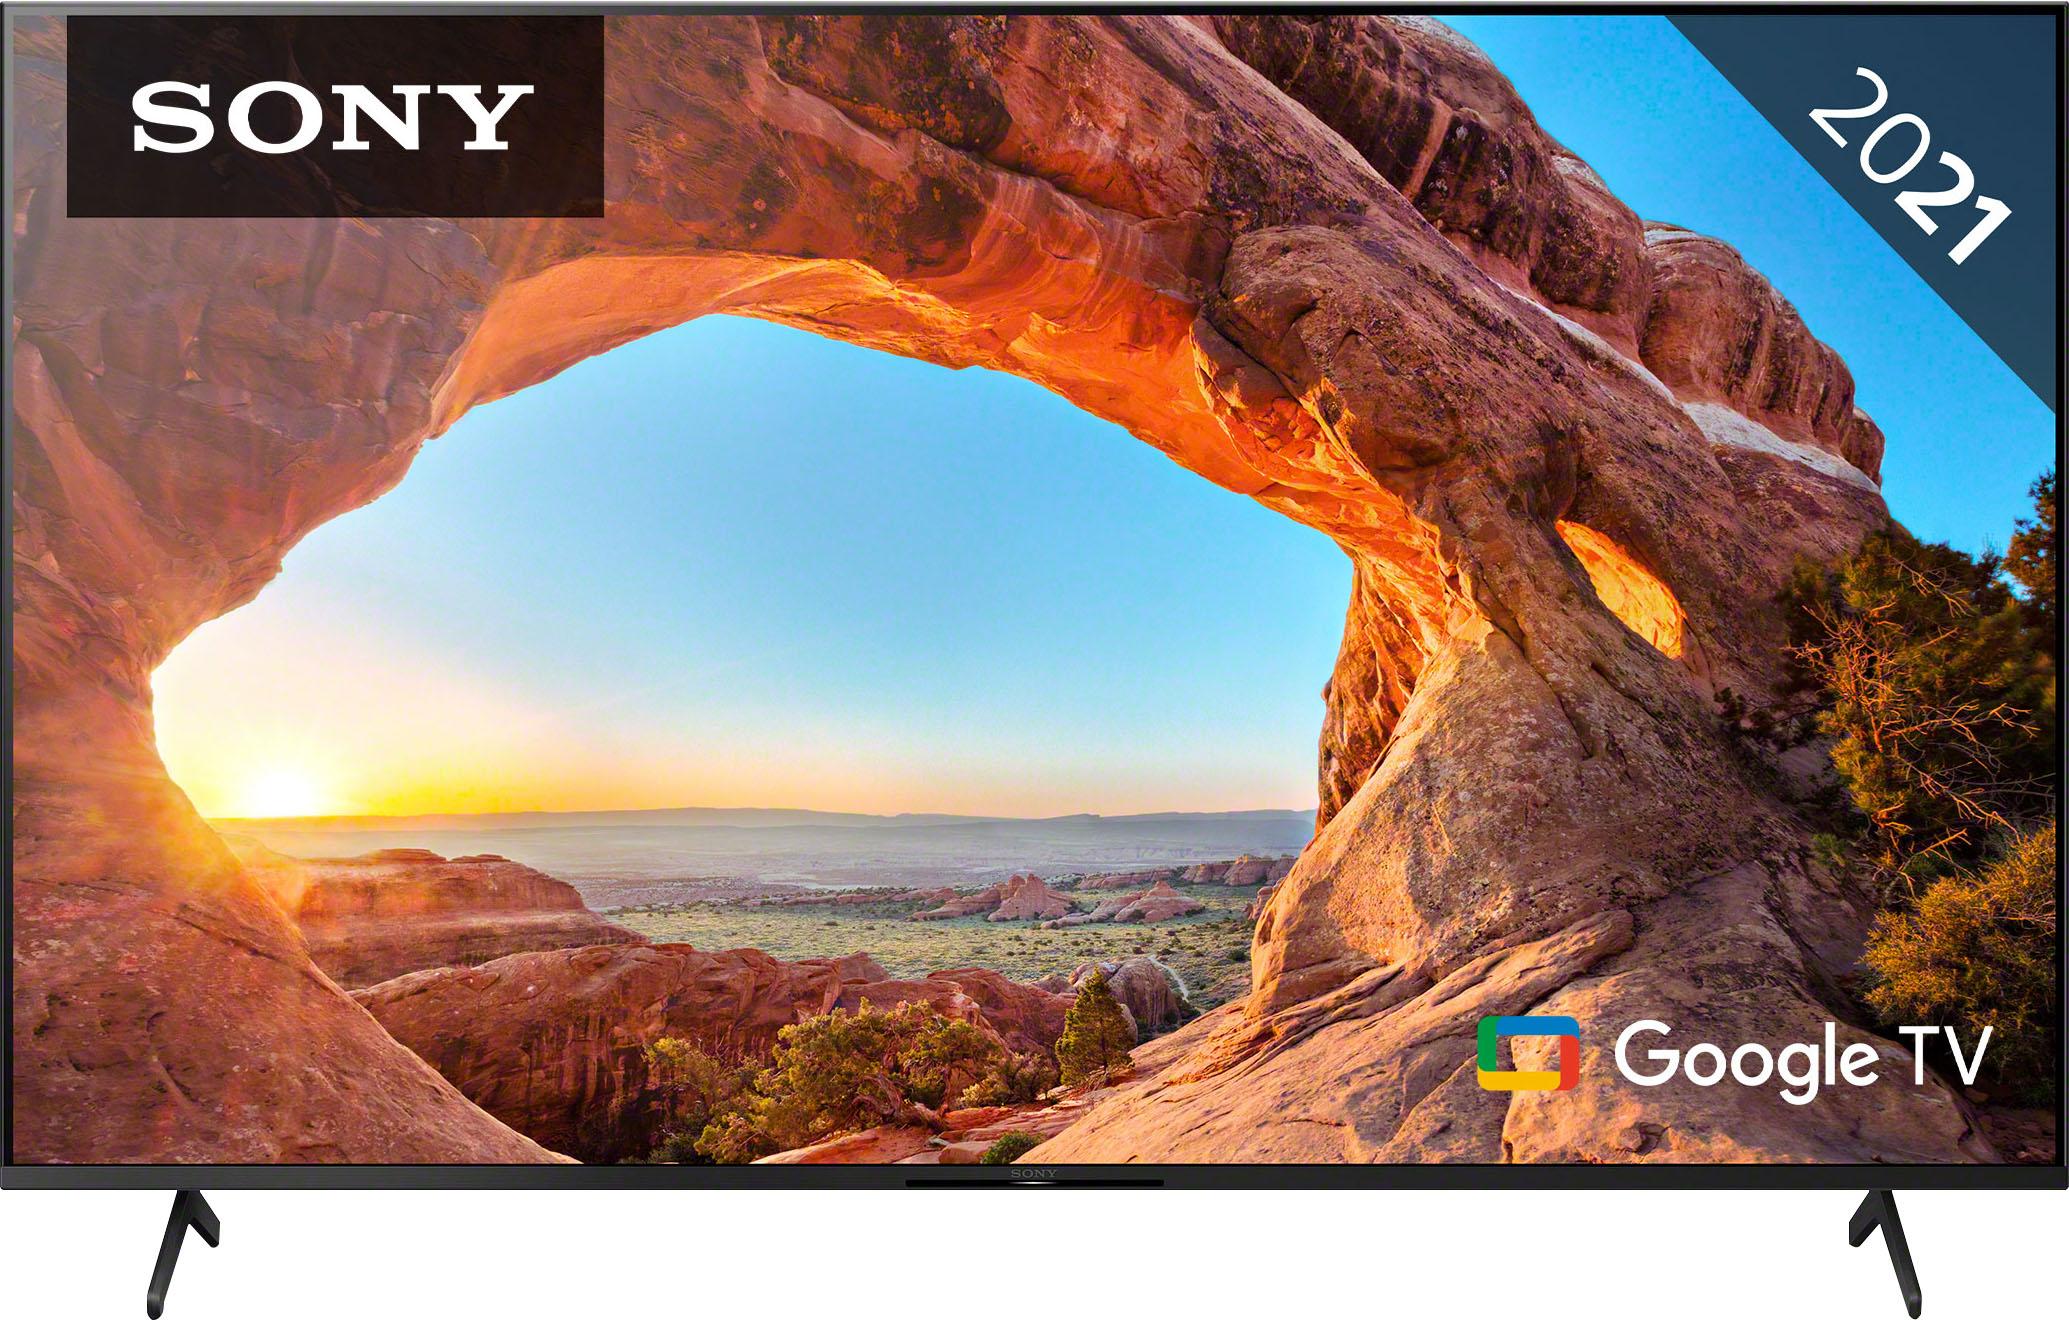 Sony LCD-LED Fernseher KD-65X85J , 164 cm 65 , 4K Ultra HD, Smart-TV, Smart TV